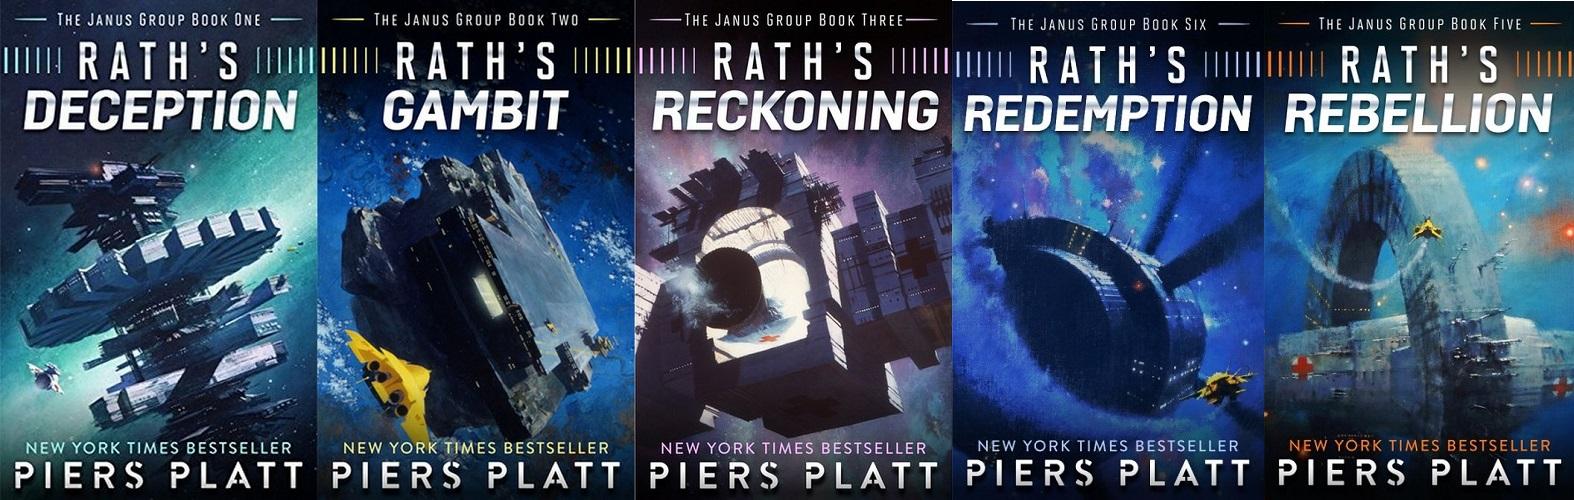 Piers Platt - Collection